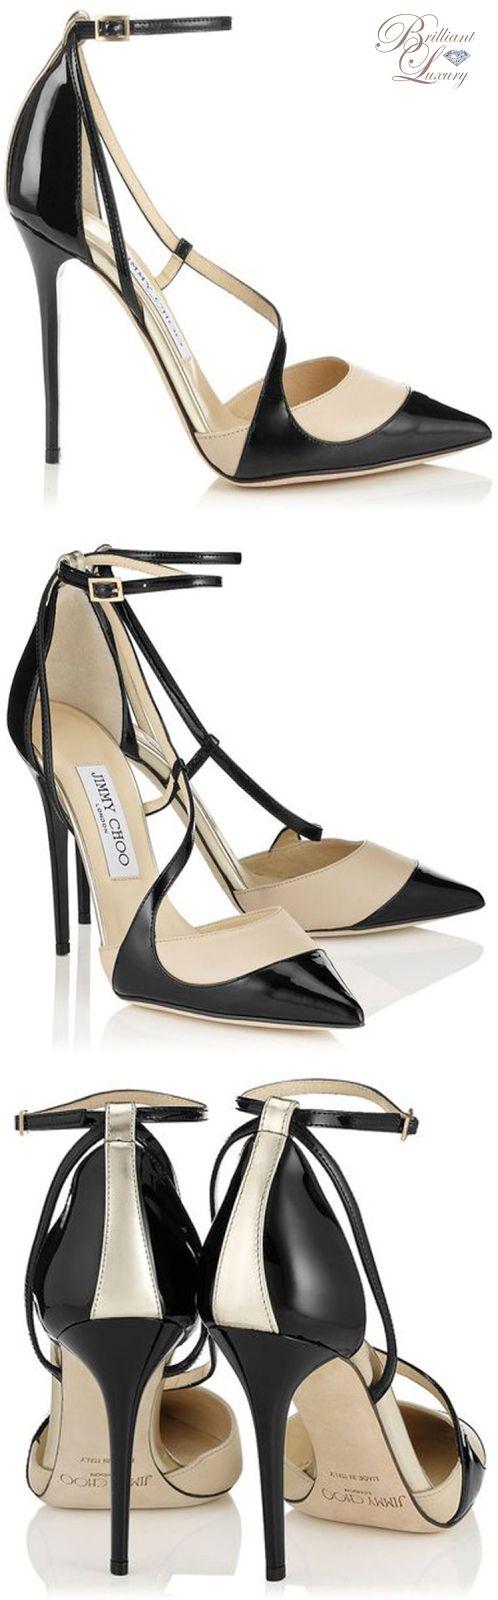 Wedding - WOMEN'S SHOES (we Always Need Shoes)